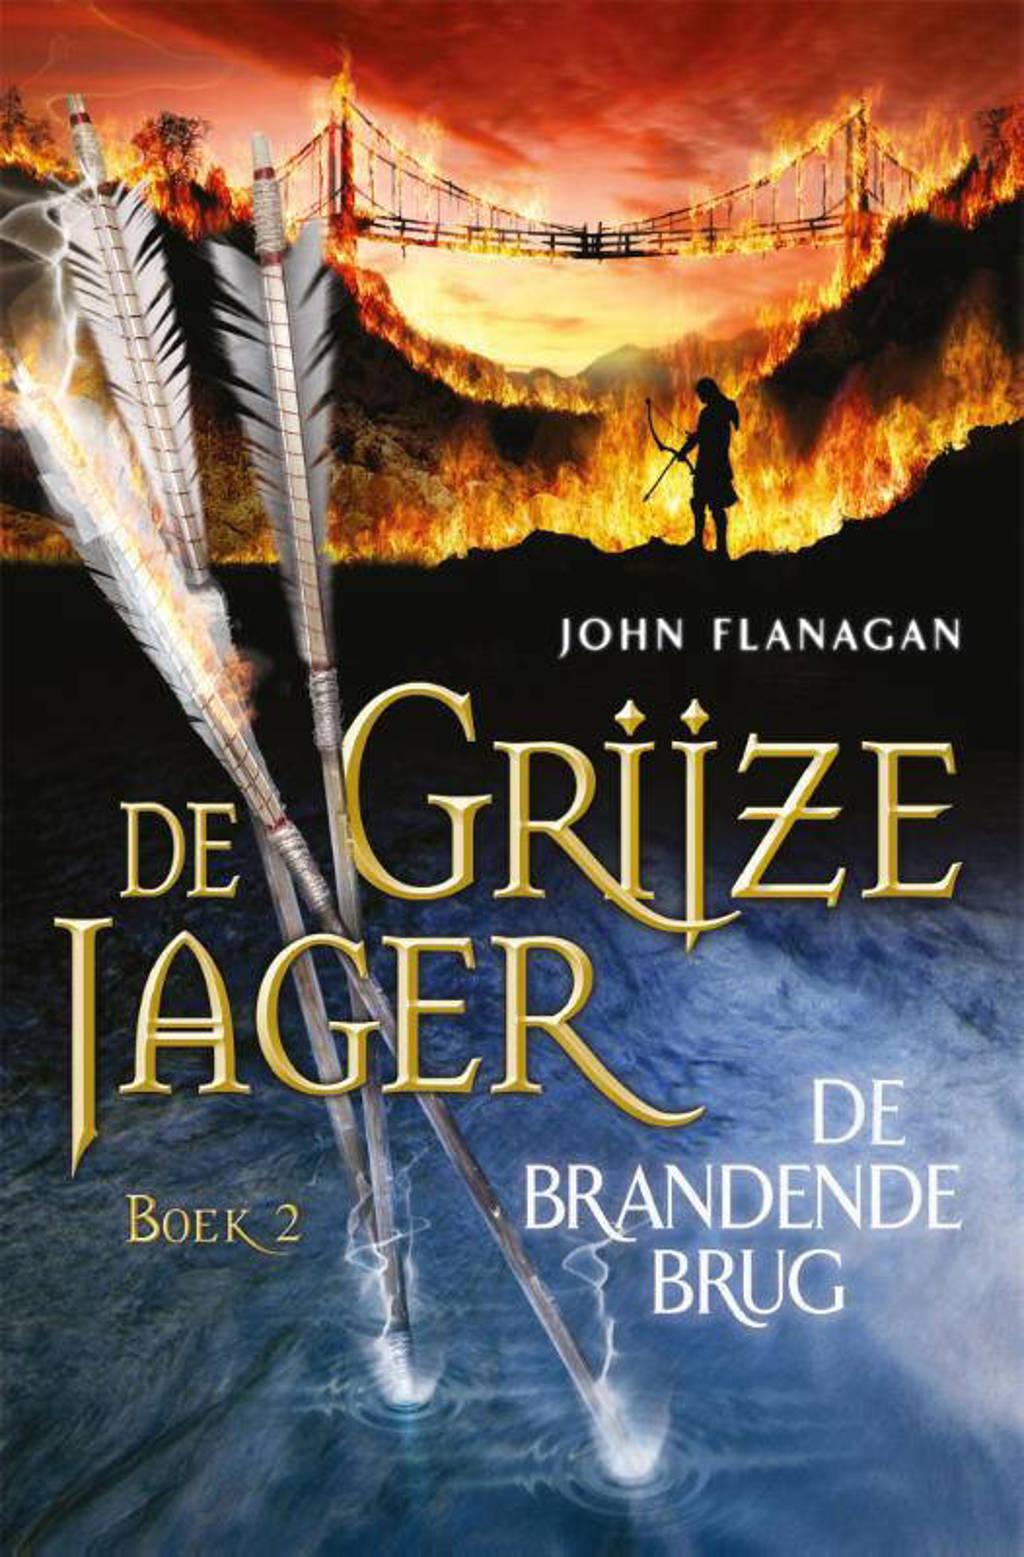 De Grijze Jager: De brandende brug - John Flanagan